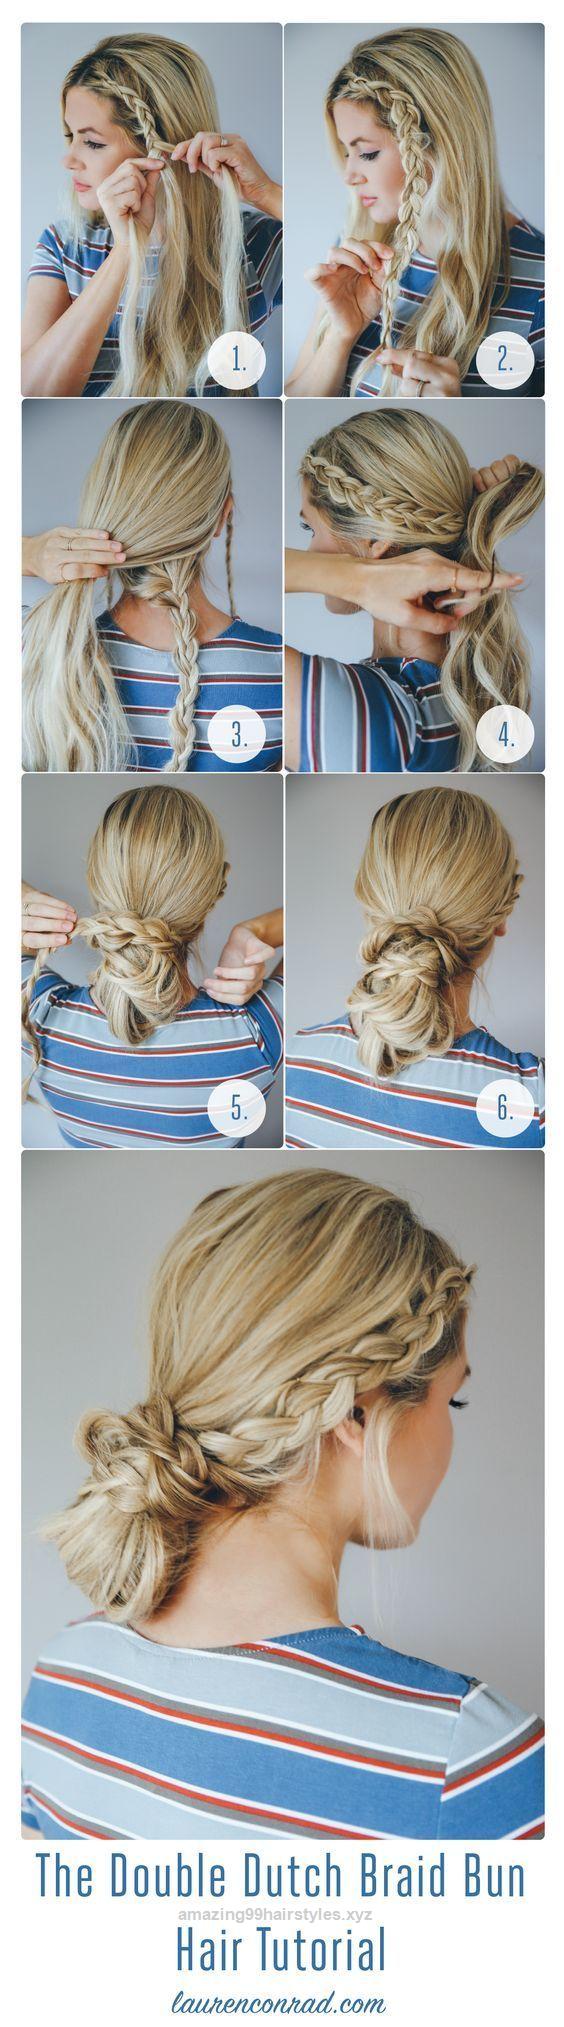 Easy hairstyles for long hair hair styles pinterest hair hair